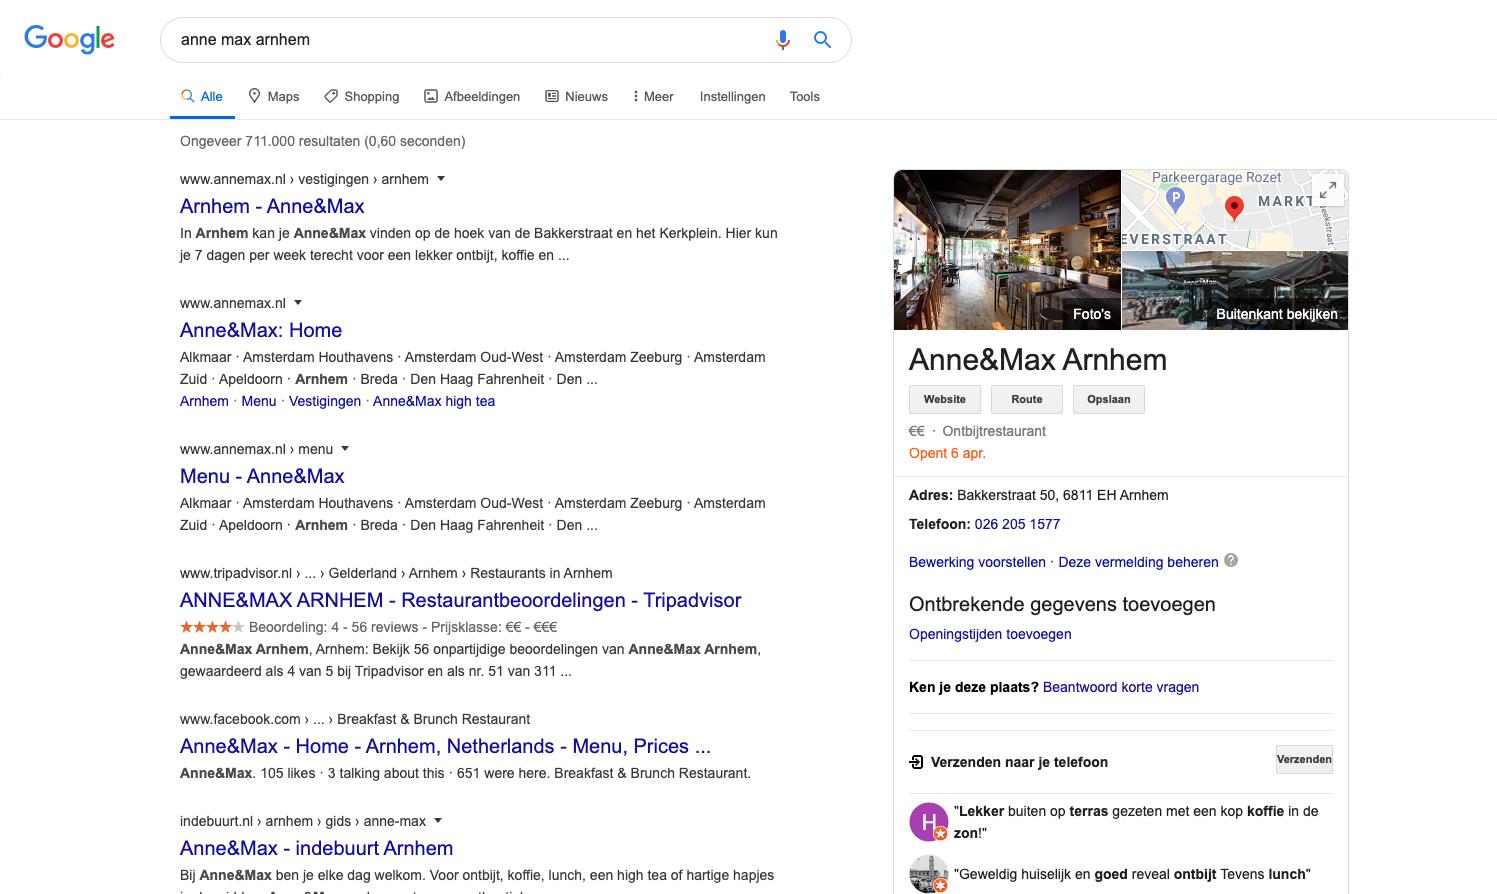 google my business screenshot anne max arnhem